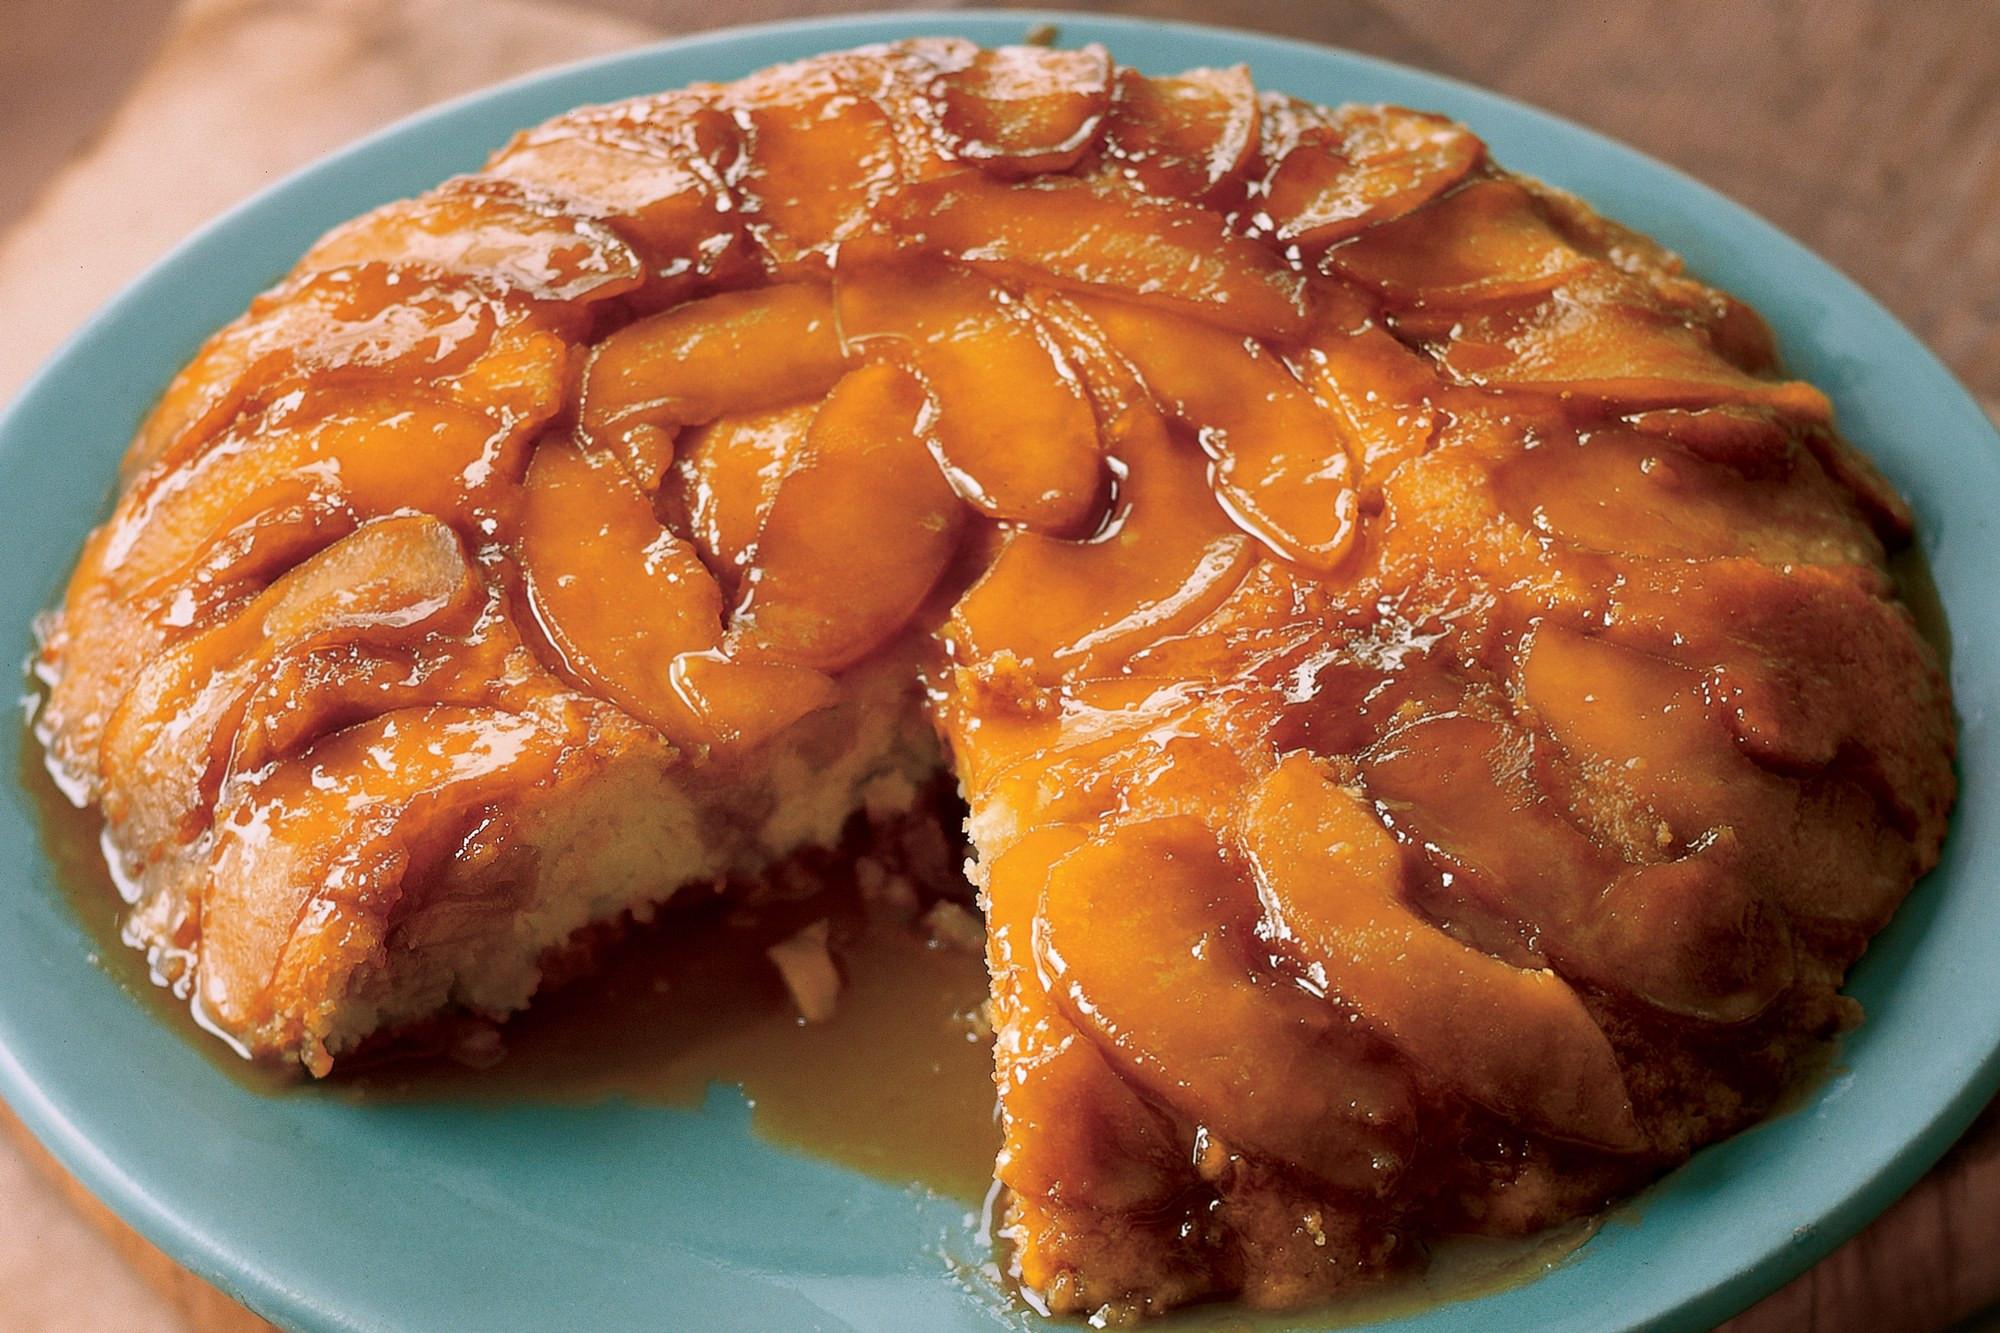 Upside Down Apple Cake  Upside Down Butterscotch Apple Sour Cream Cake recipe